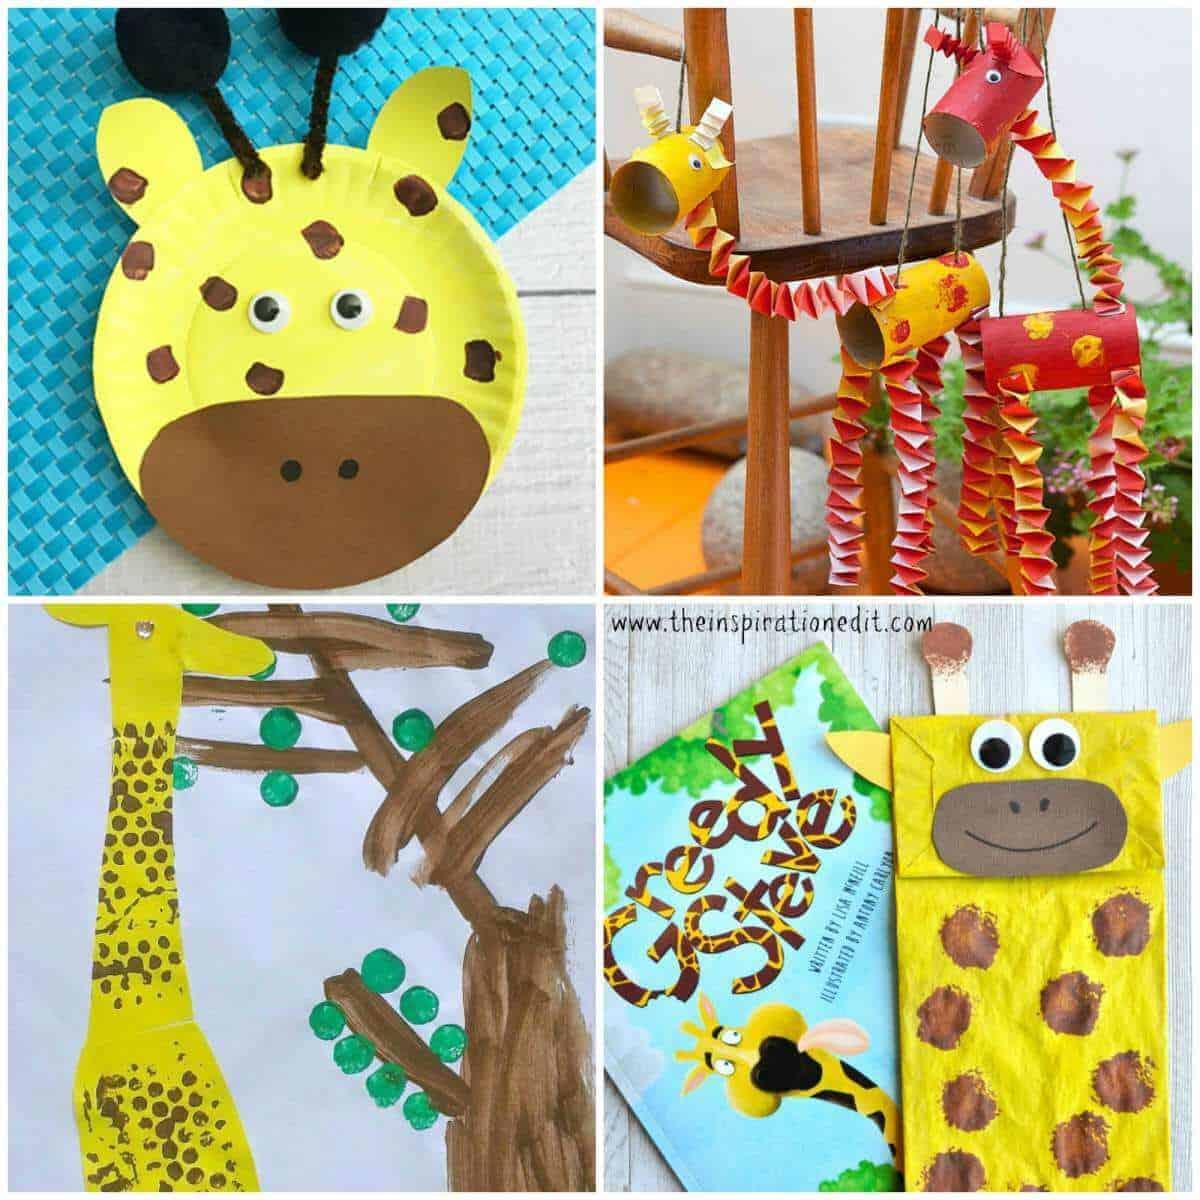 Easy Giraffe Bookmark 8. Paper Plate Giraffe 9. DIY Giraffe Growth Chart 10. Easy Giraffe Bookmark Corner 11. Paper Bag Giraffe Craft  sc 1 st  The Inspiration Edit & 13 Fantastic Giraffe Crafts For Kids · The Inspiration Edit